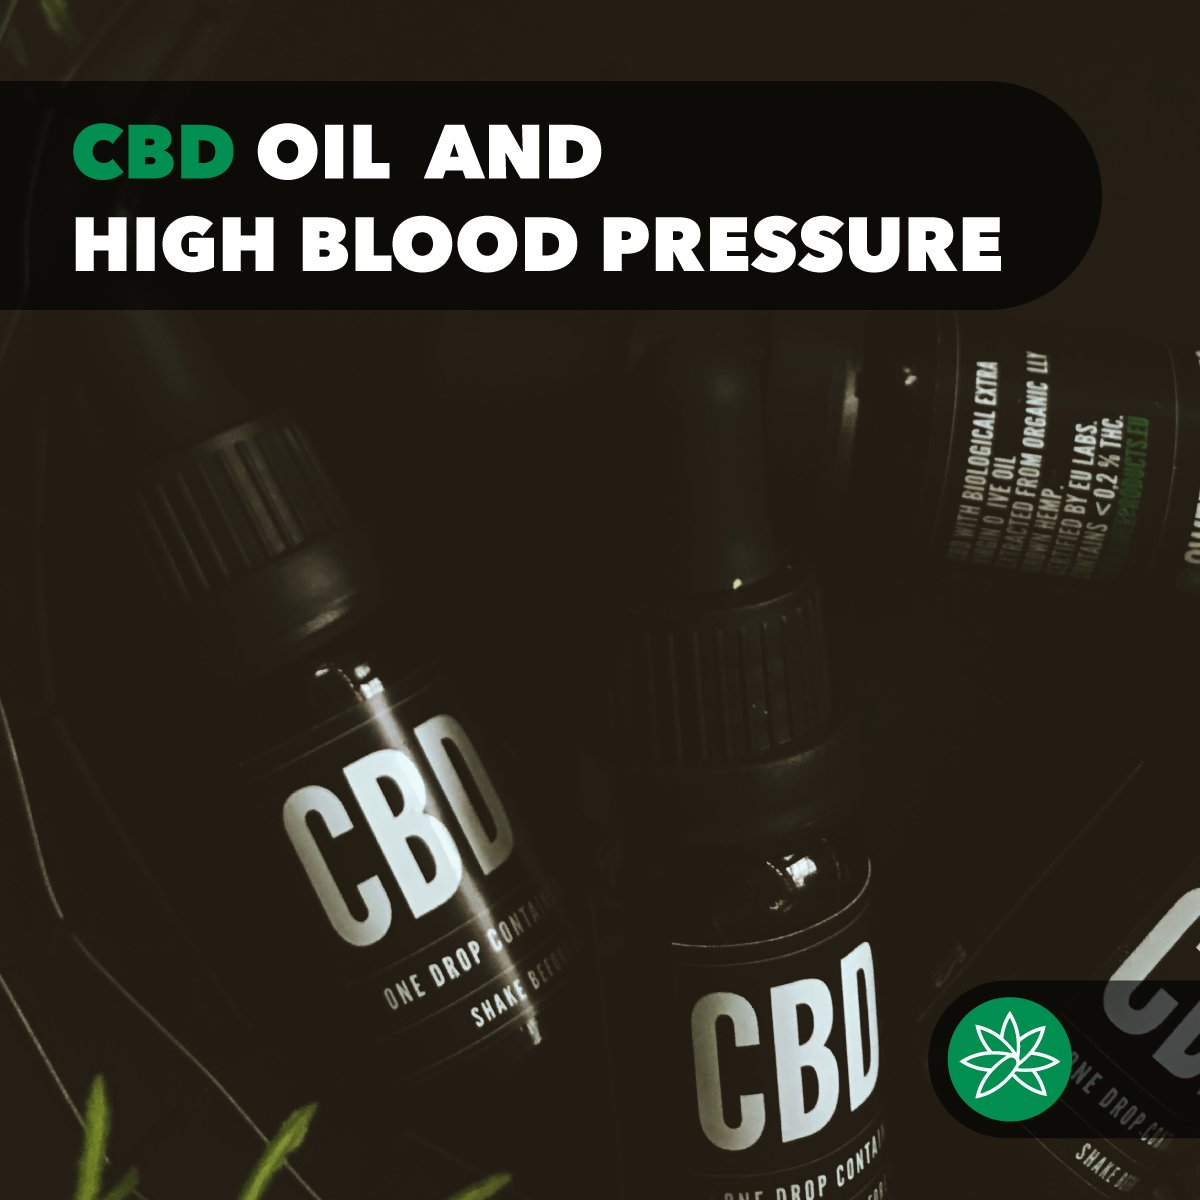 CBD oil and high blood pressure